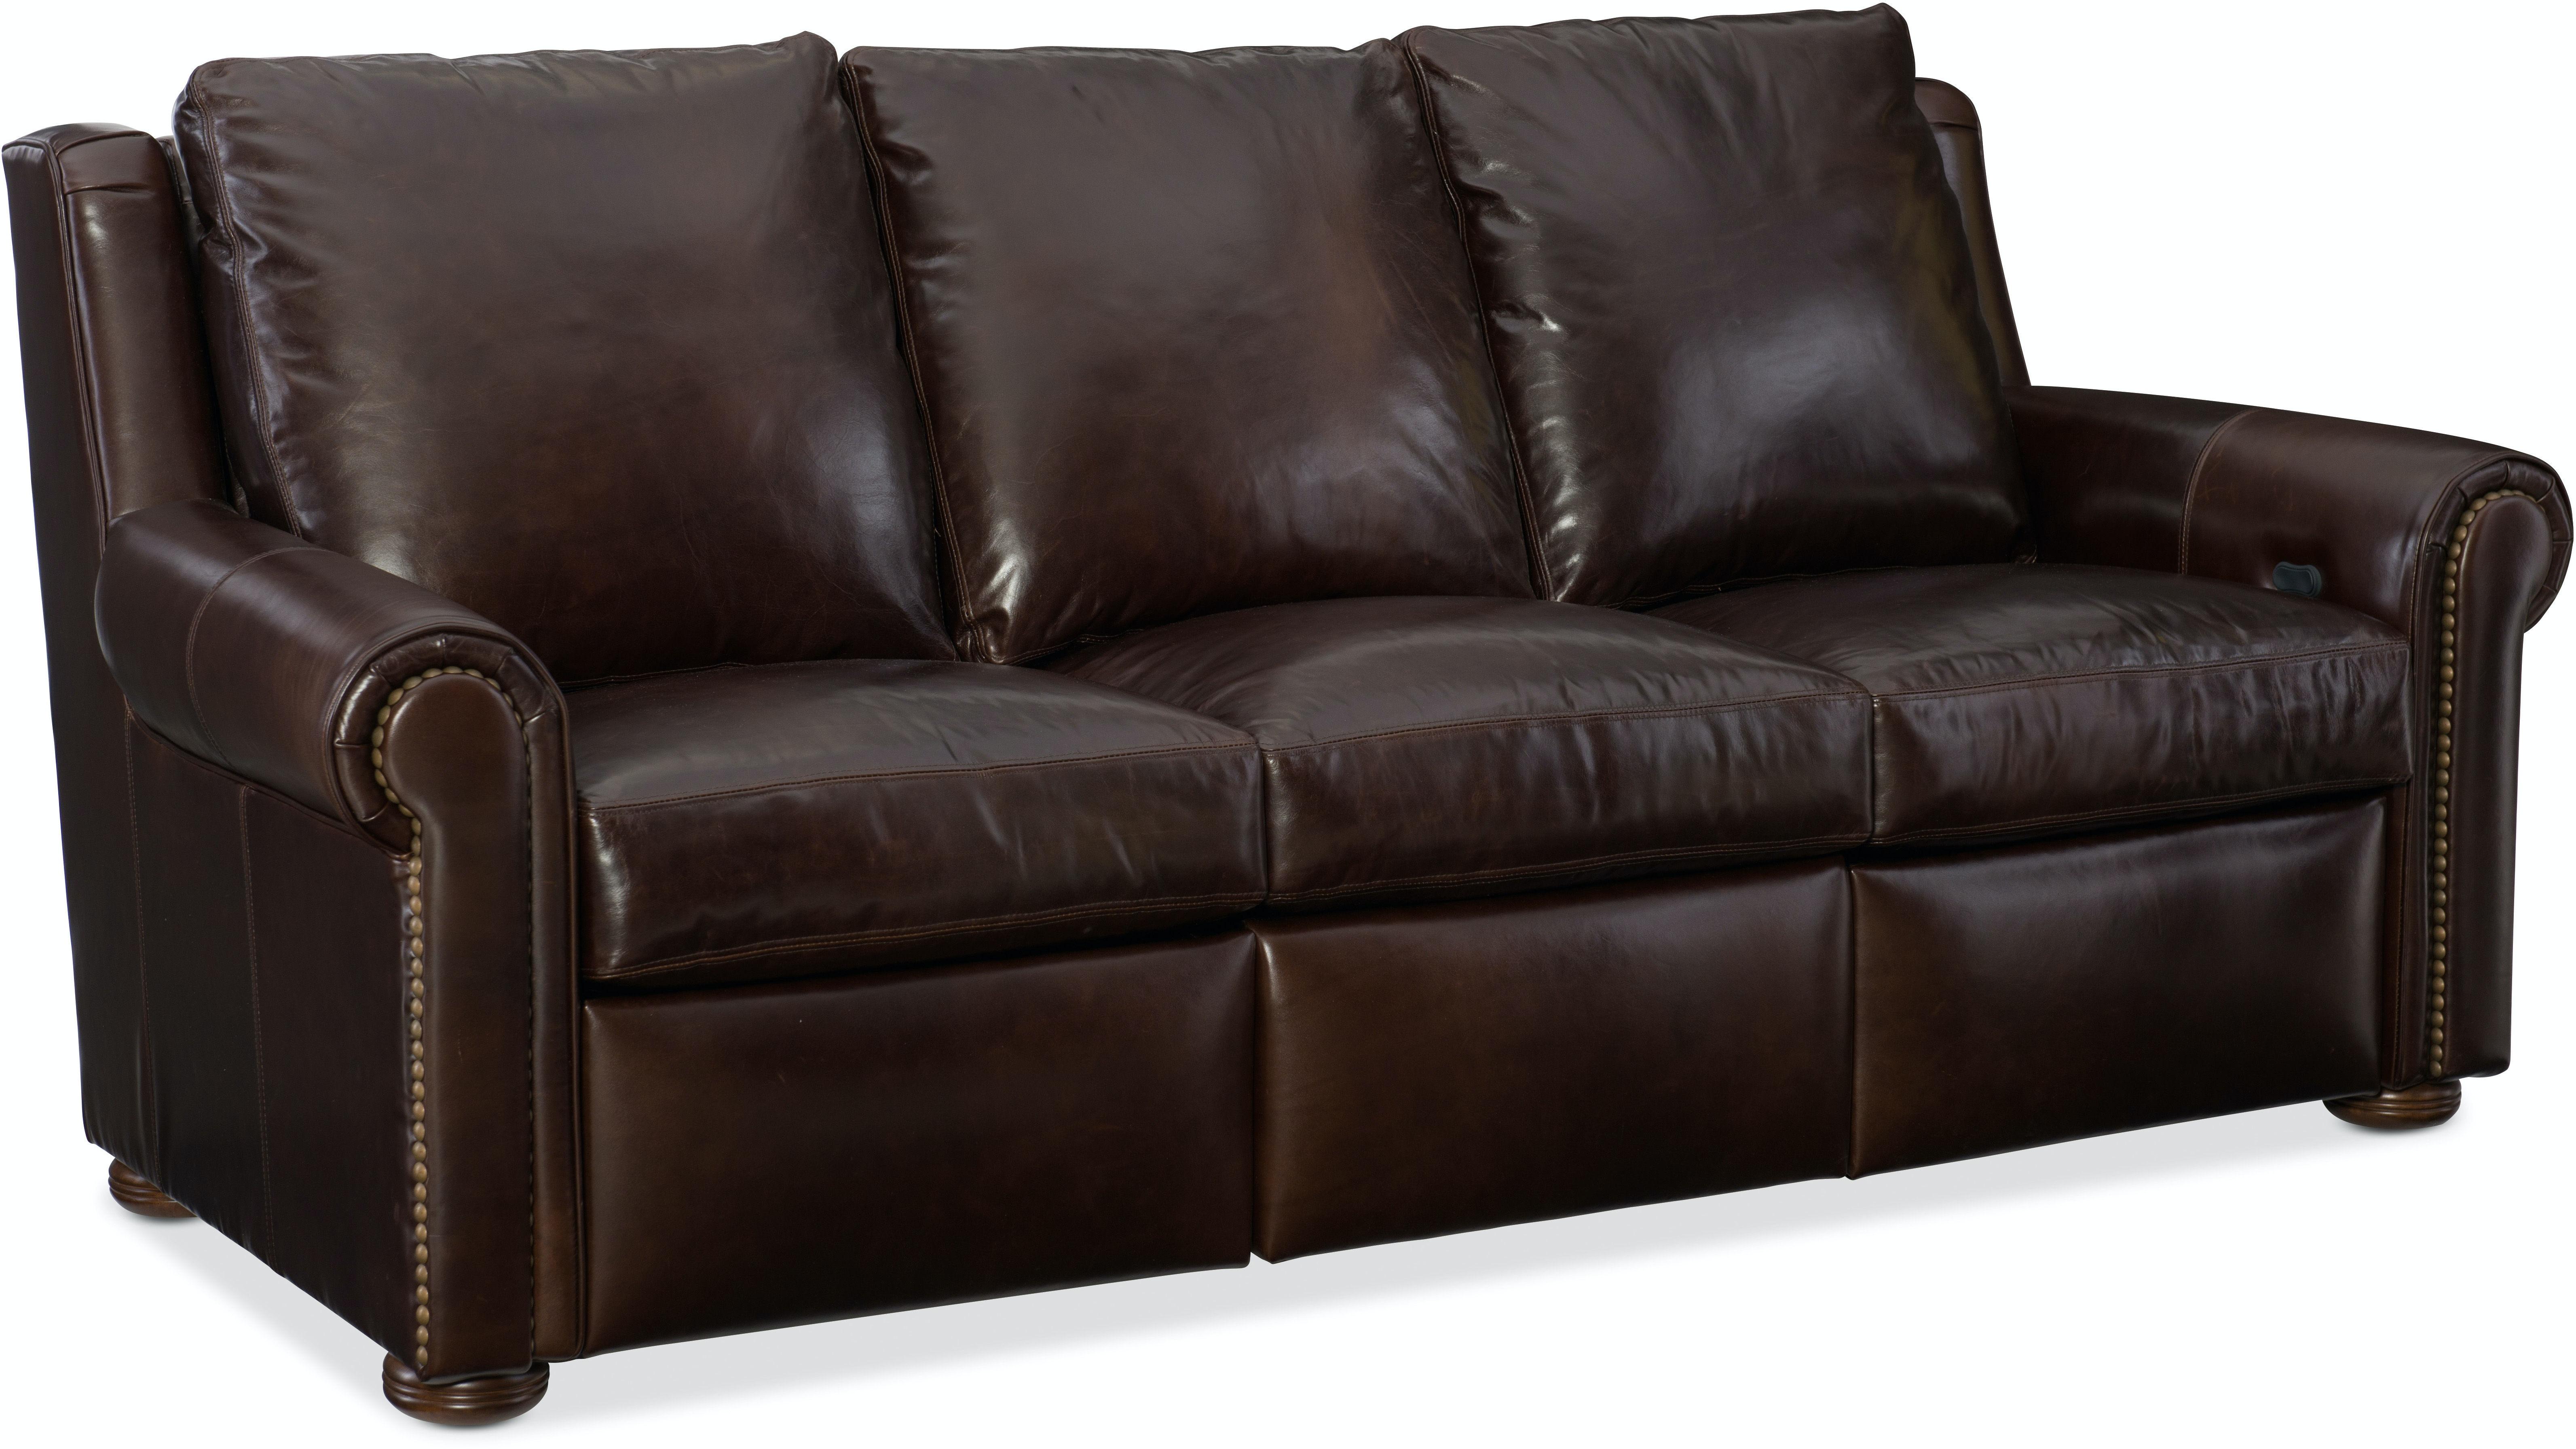 Bradington-Young Whitaker Sofa - Full Recline at both Arms 920-90